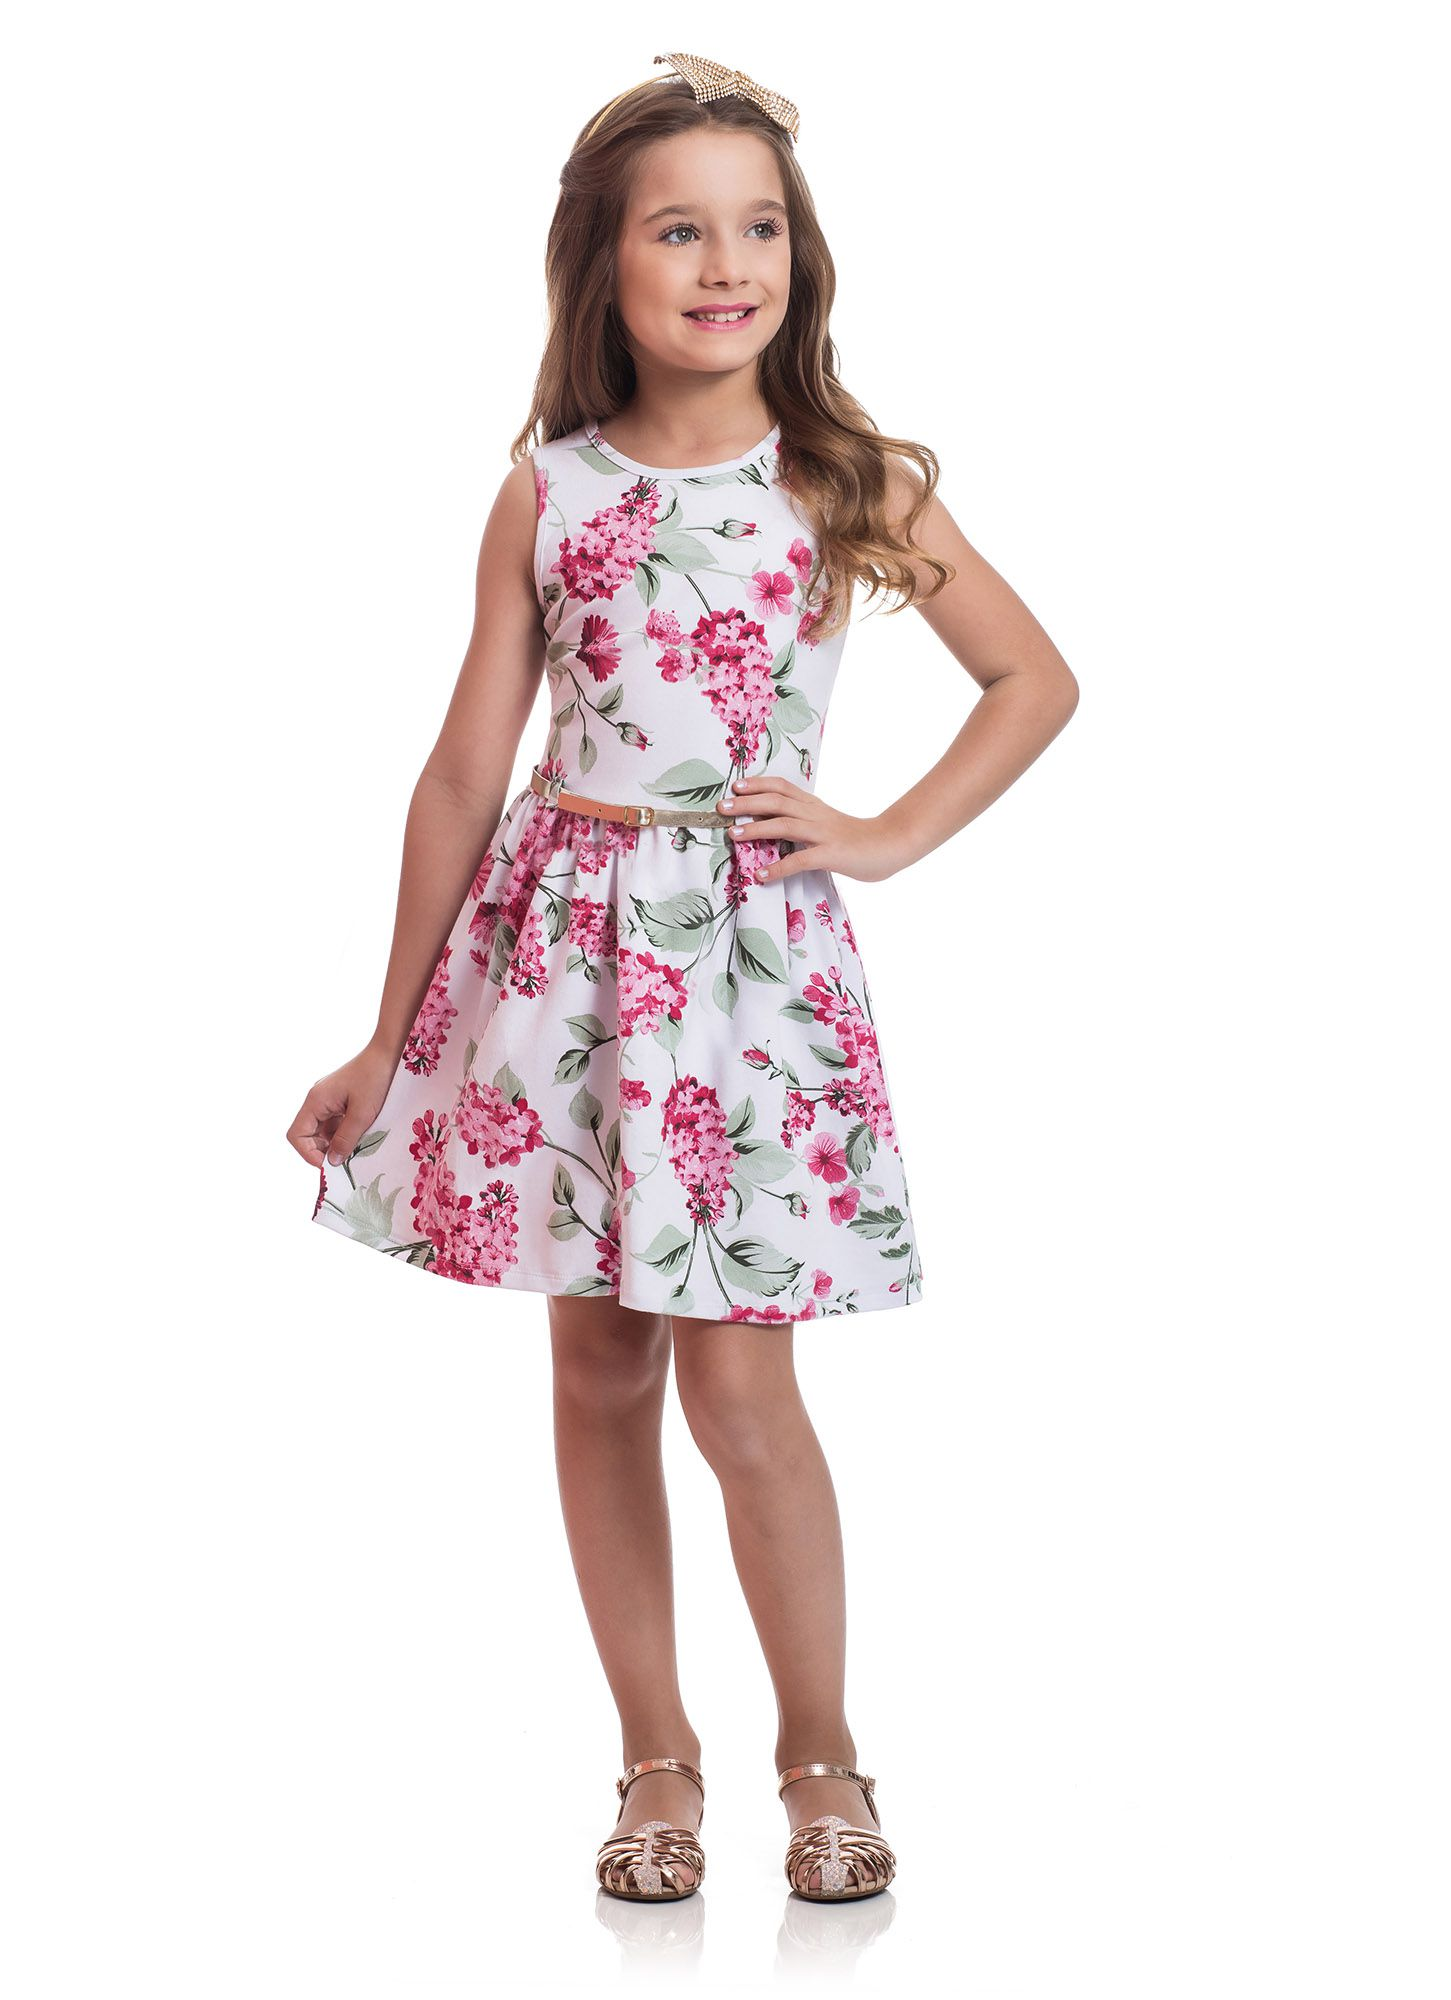 Vestido Infantil Cotton TMX  Floral Marfim / Tamanho 4